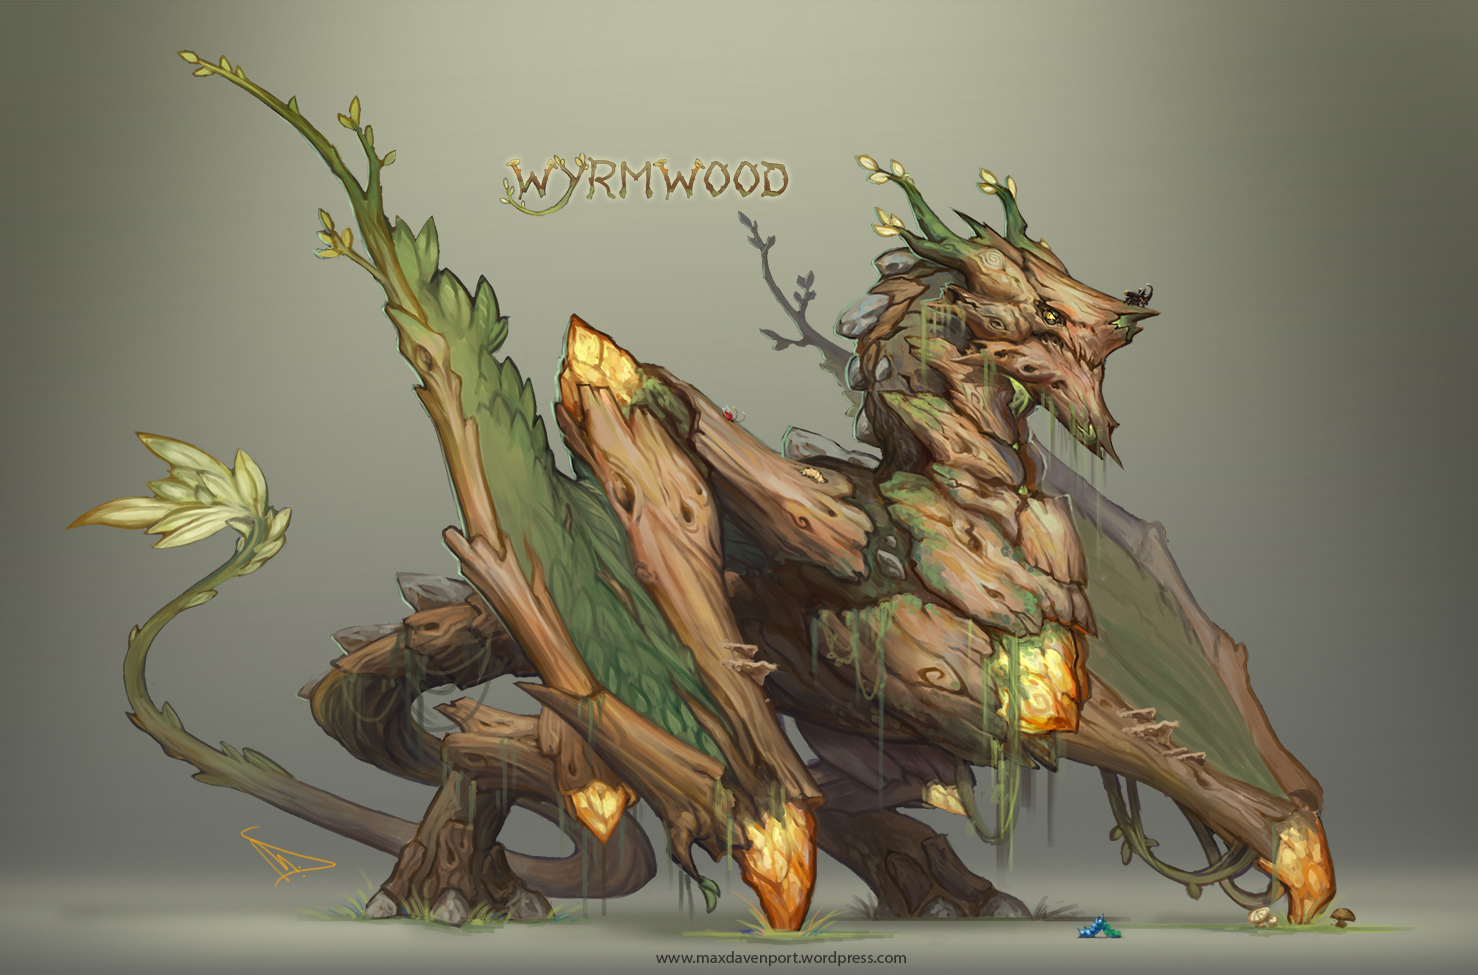 Substrata - Wyrmwood